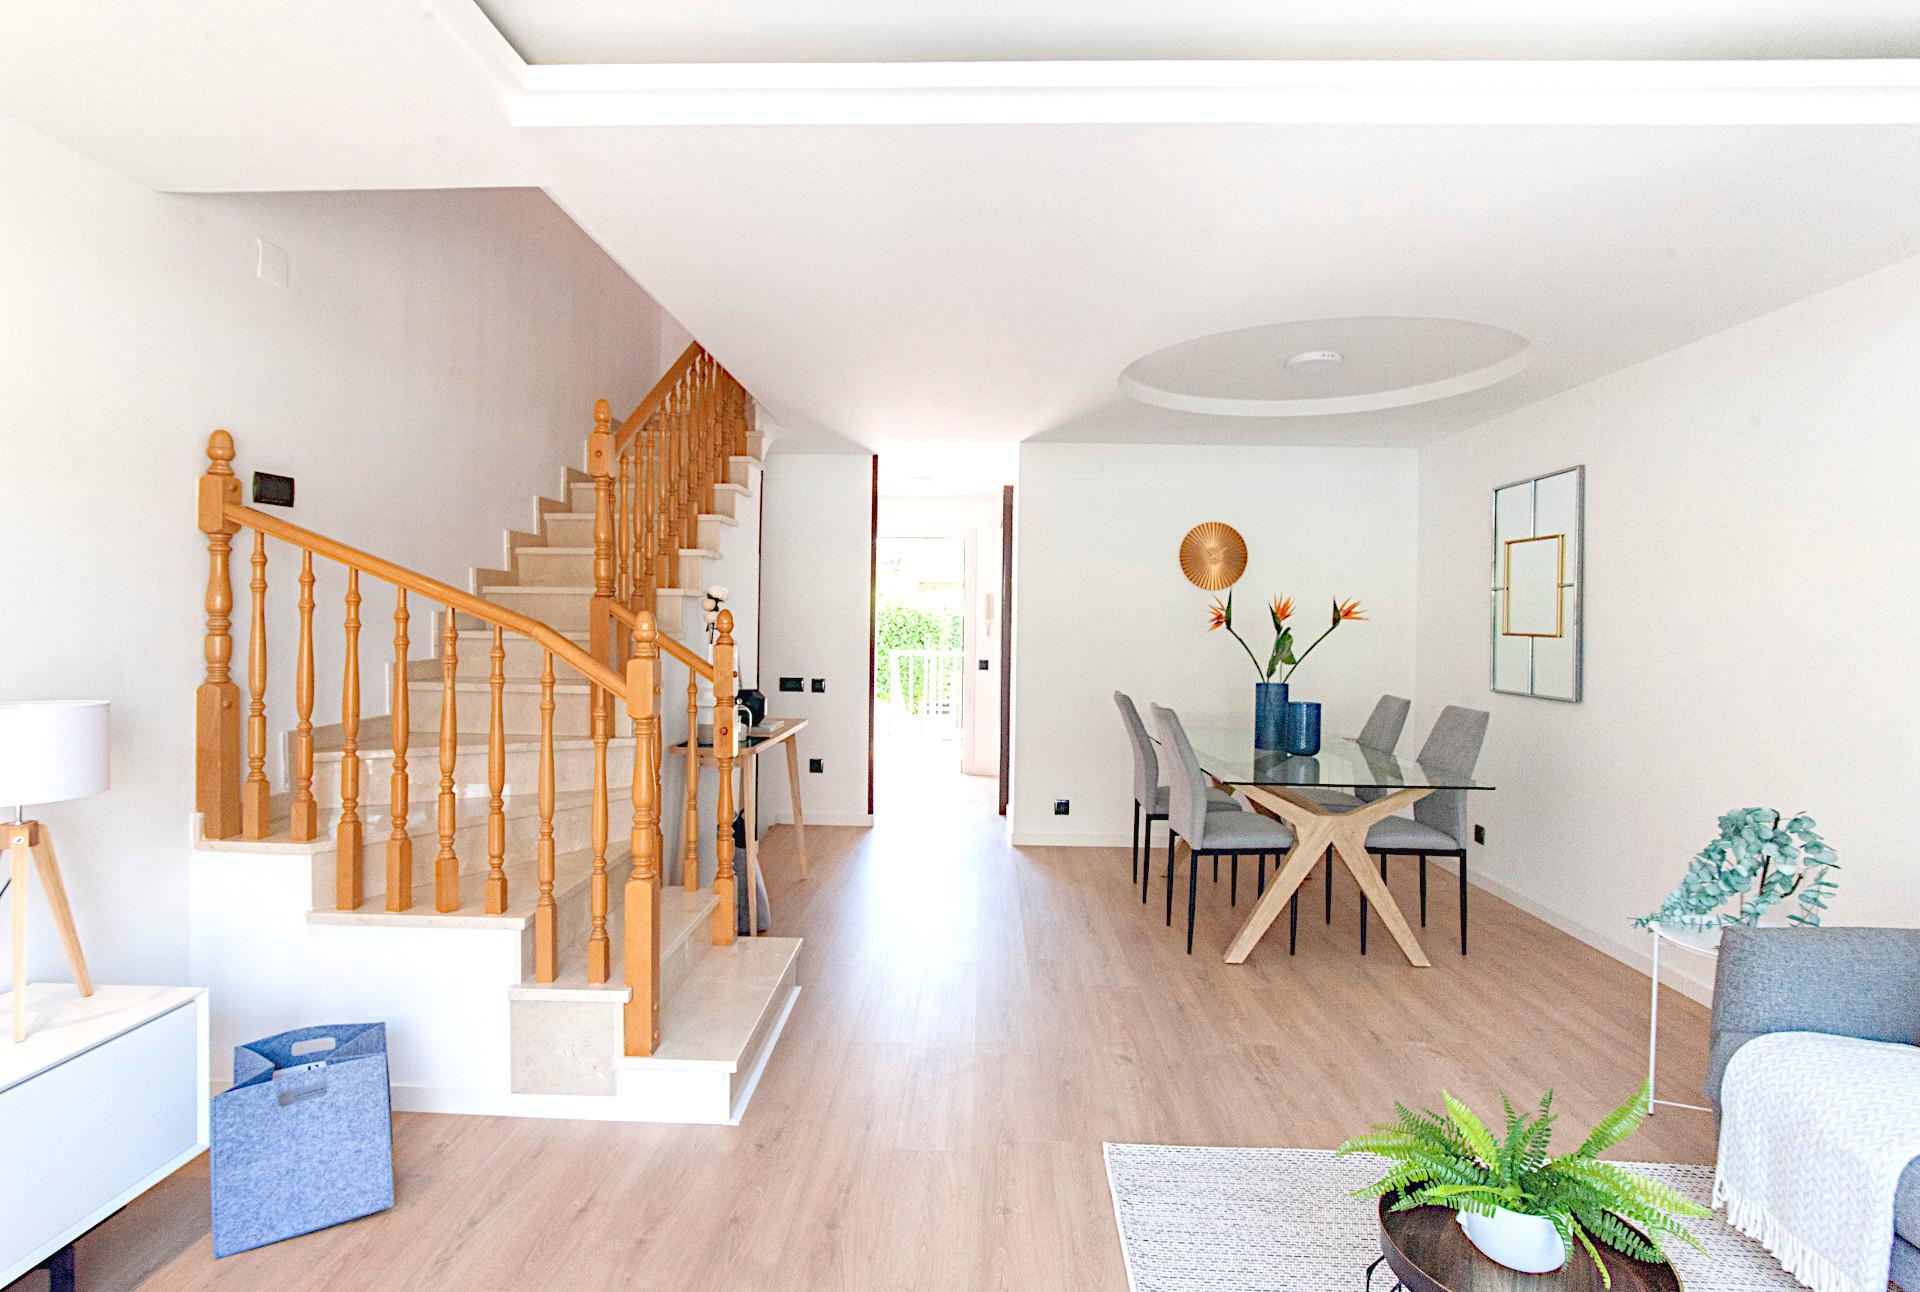 Markham Stagers Home Staging captación en exclusiva